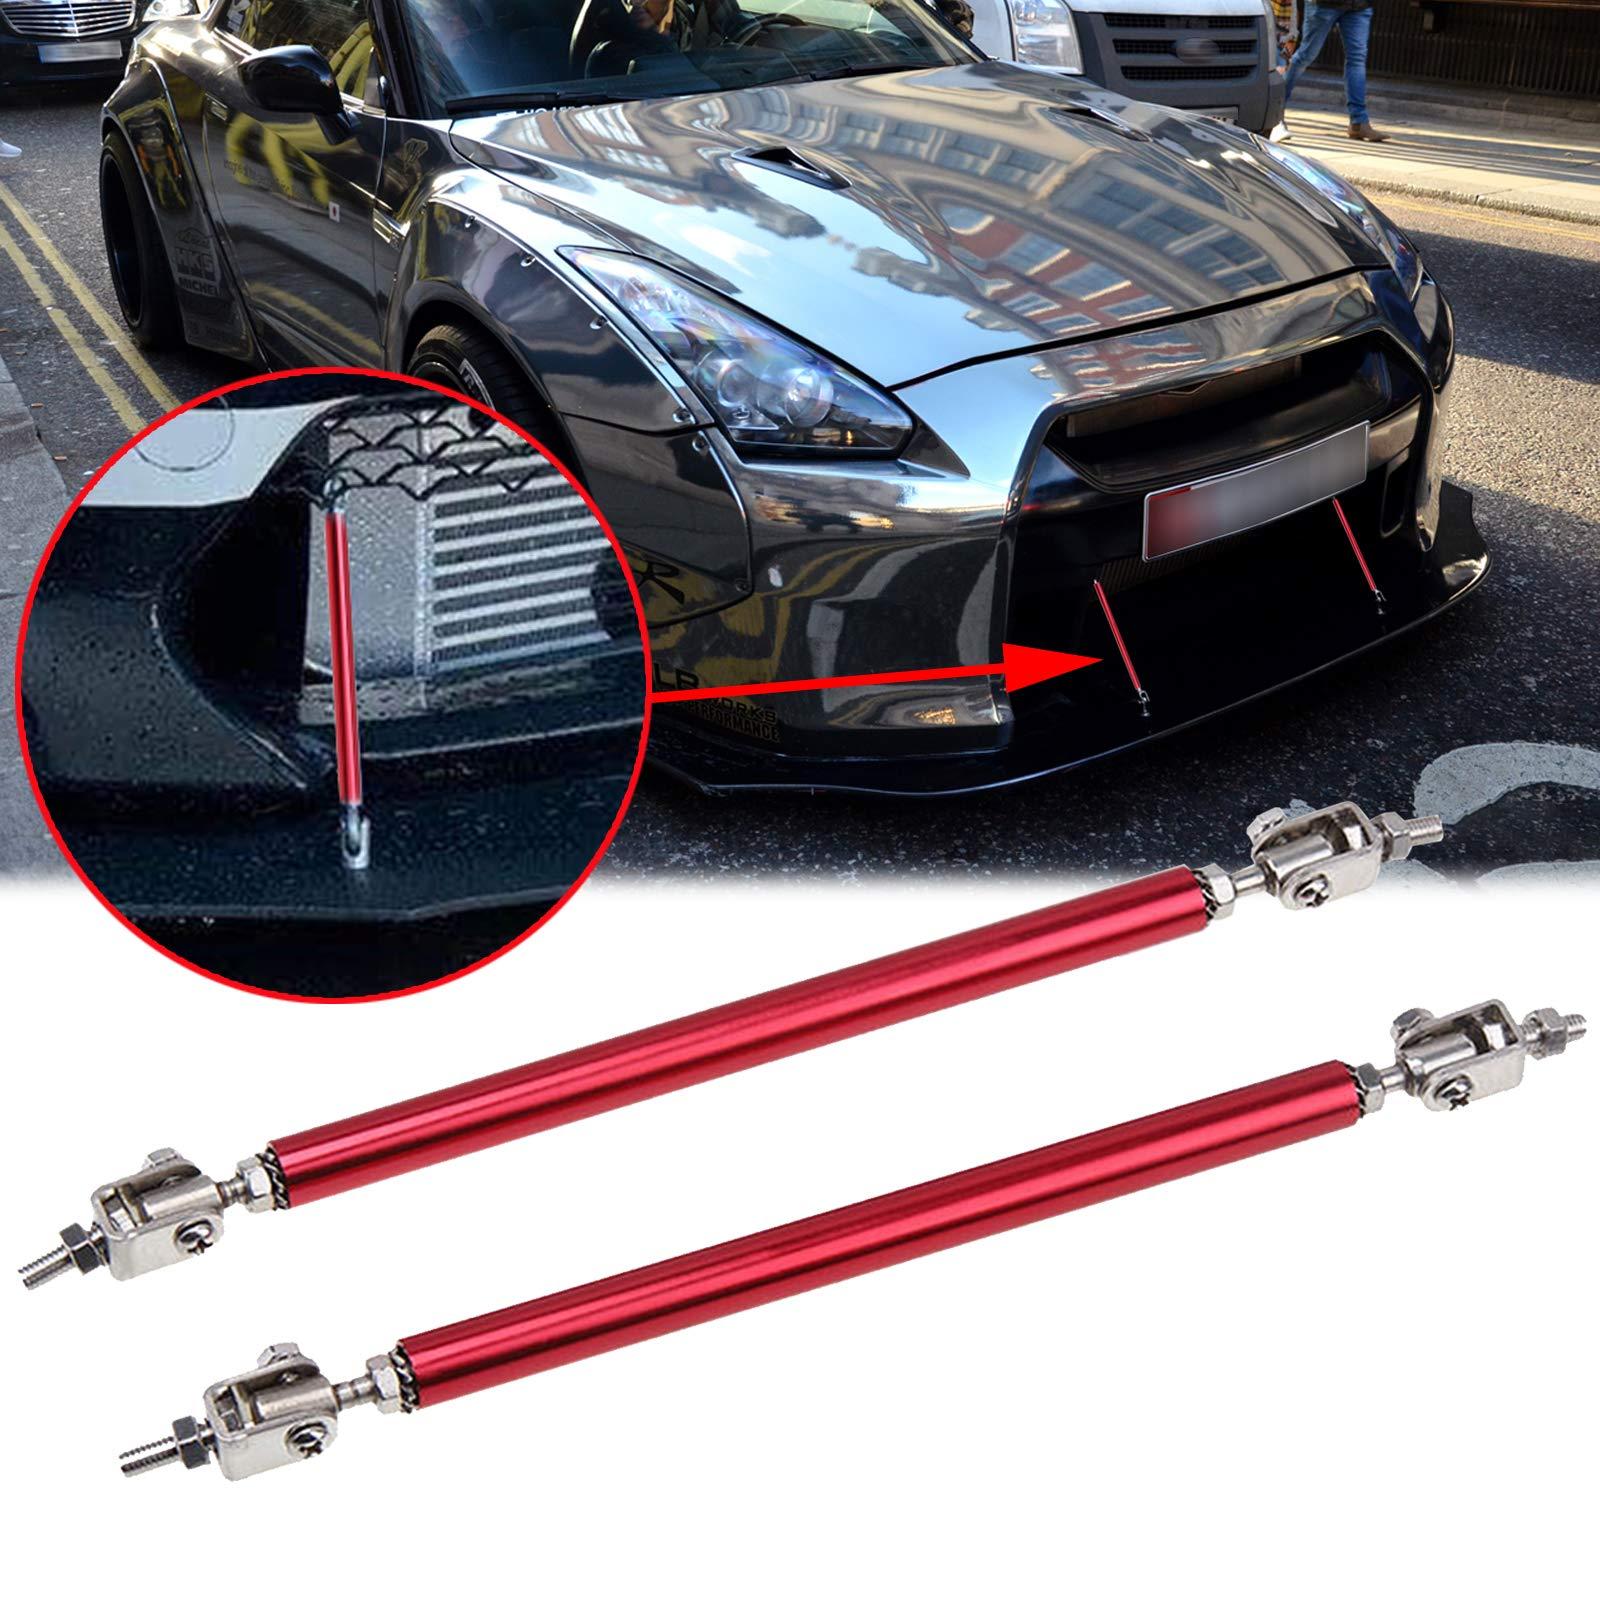 "2pc Adjustable 8""-11"" Front Bumper Lip Splitter Diffuser Strut Rod Tie Bars Splitter Support Rod Fit Most Vehicles[Red]"